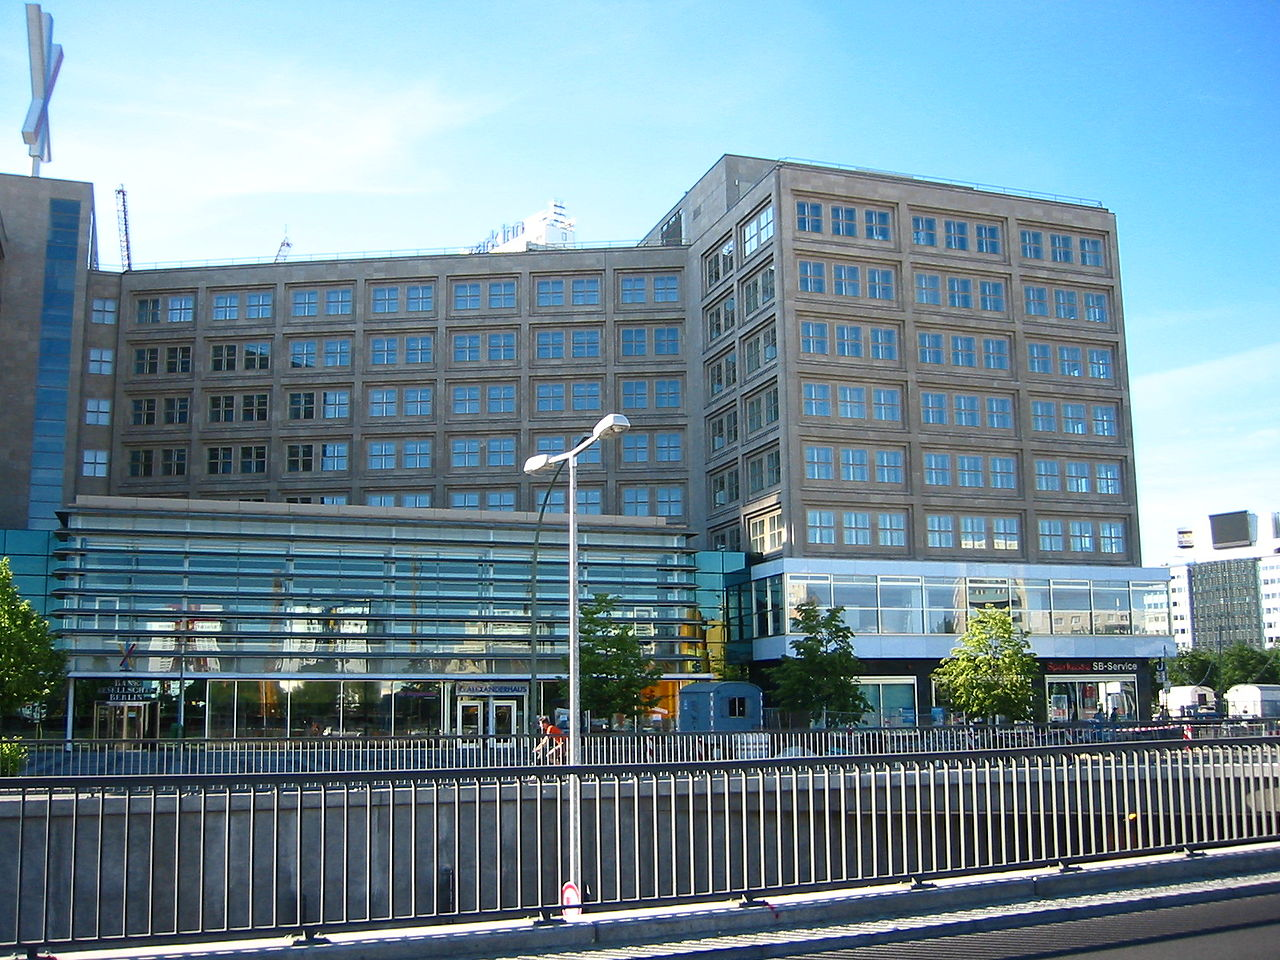 H Berlin Alexanderplatz Hotel